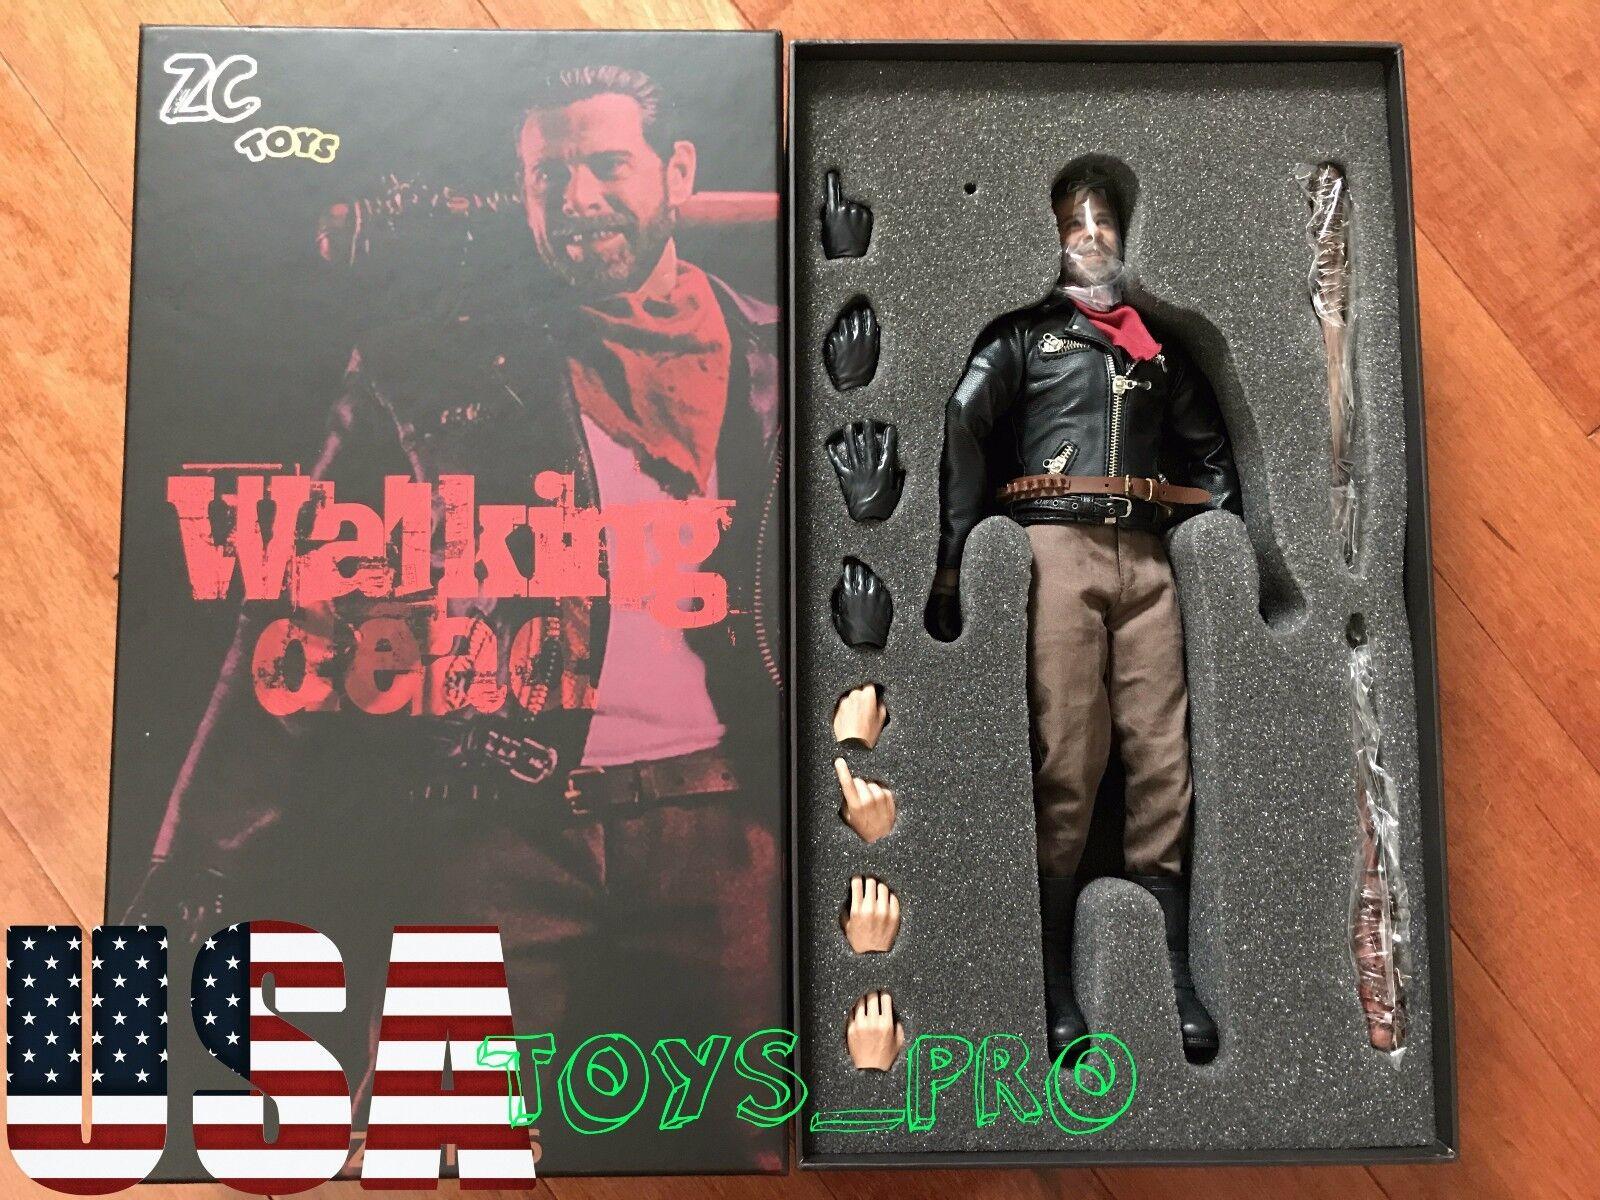 1 6 NEGAN Jeffrey Dean The Walking Dead Figure Full Set with Lucille ❶USA❶